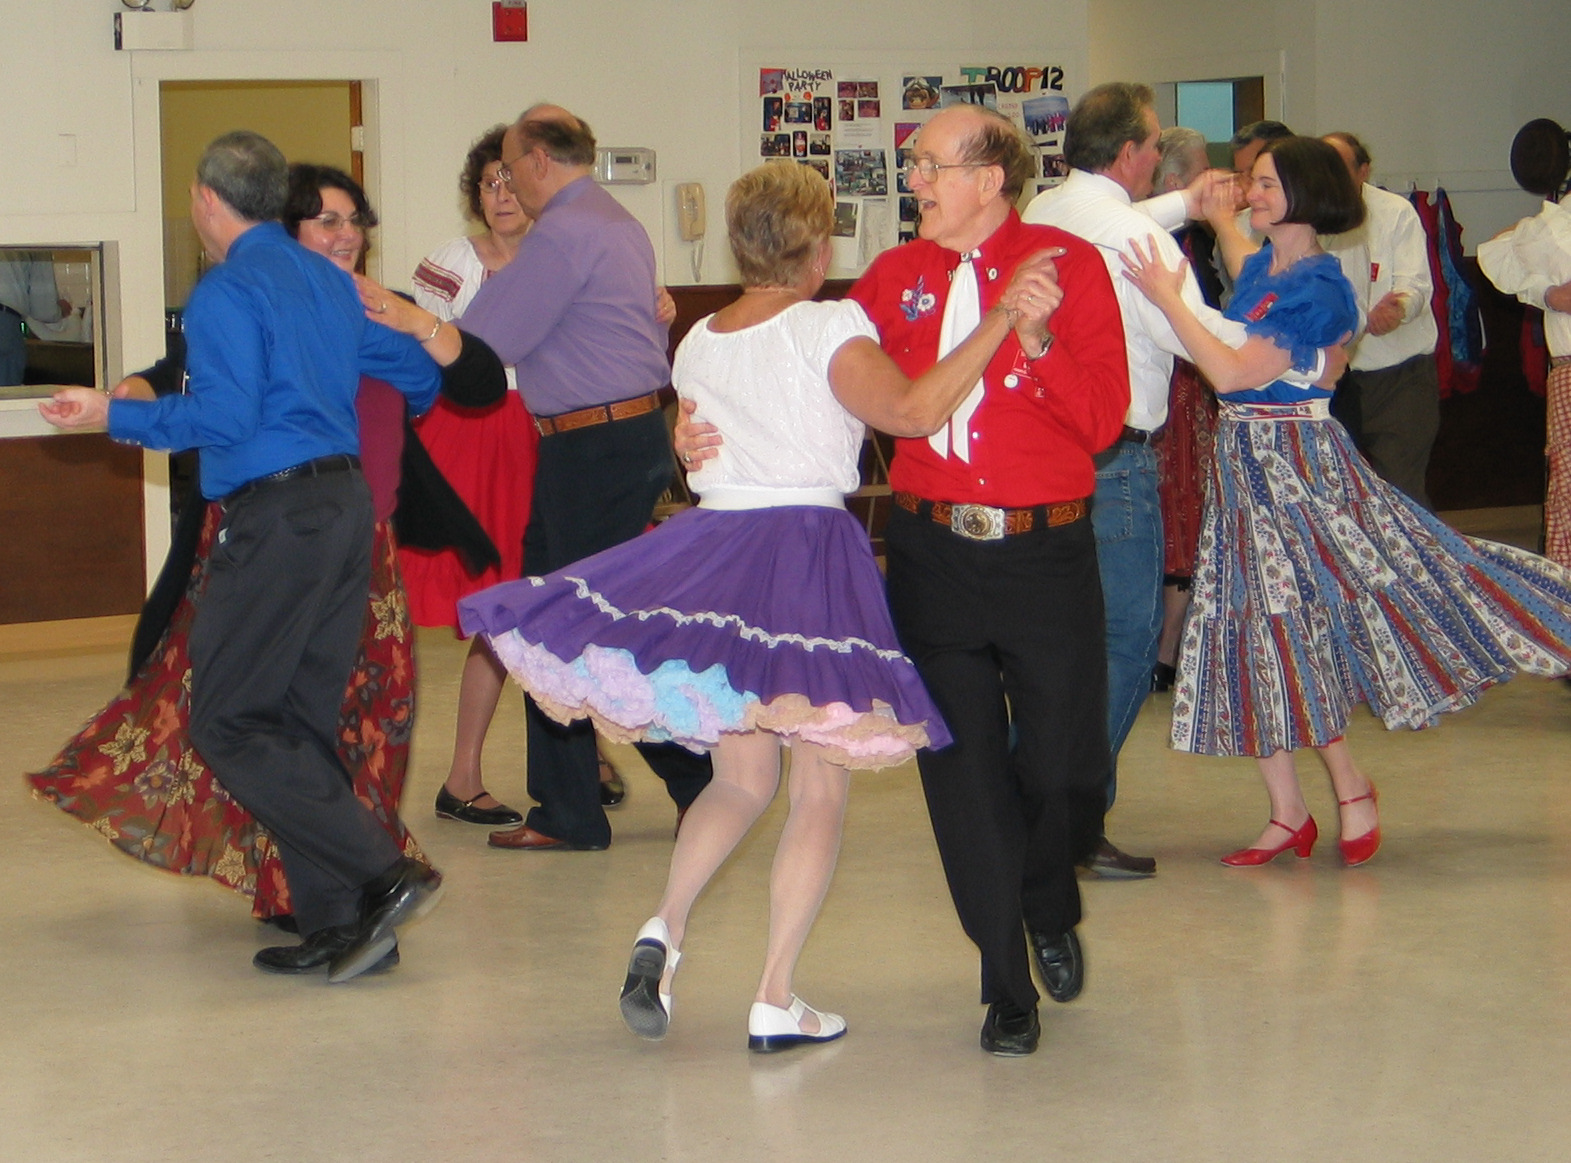 Dance Activities For Seniors